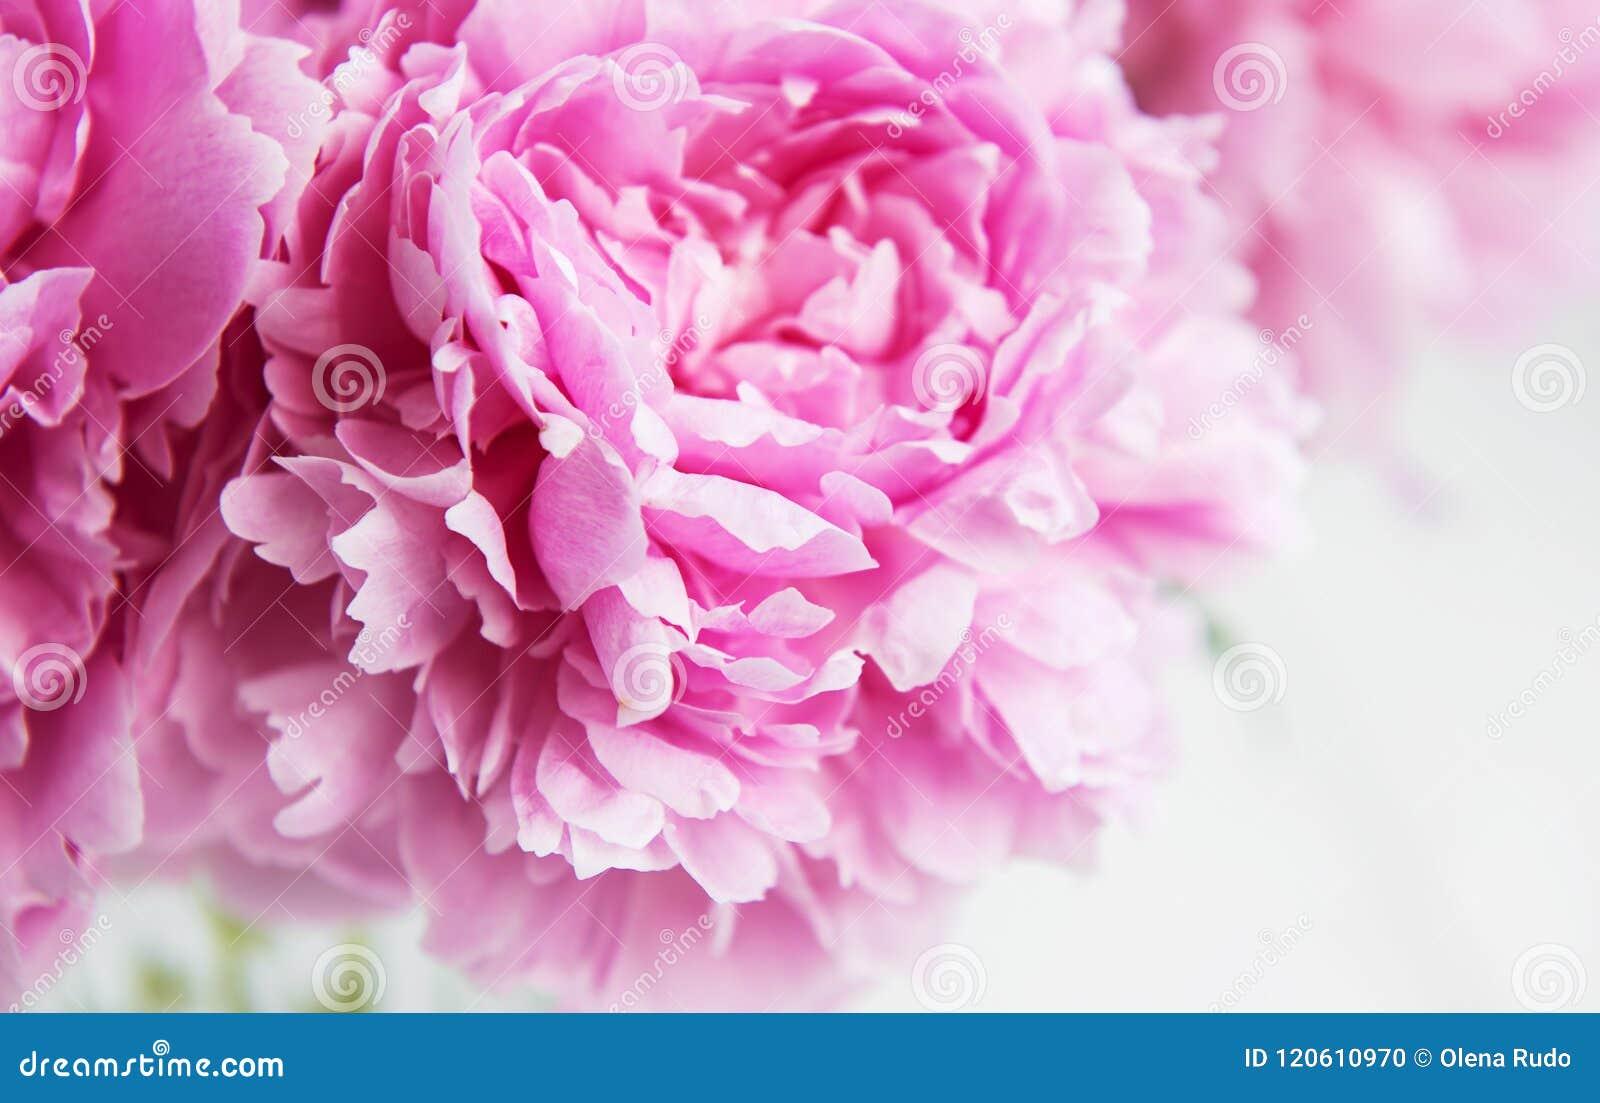 Beauty pink peony flowers stock photo image of blush 120610970 beauty pink peony flowers izmirmasajfo